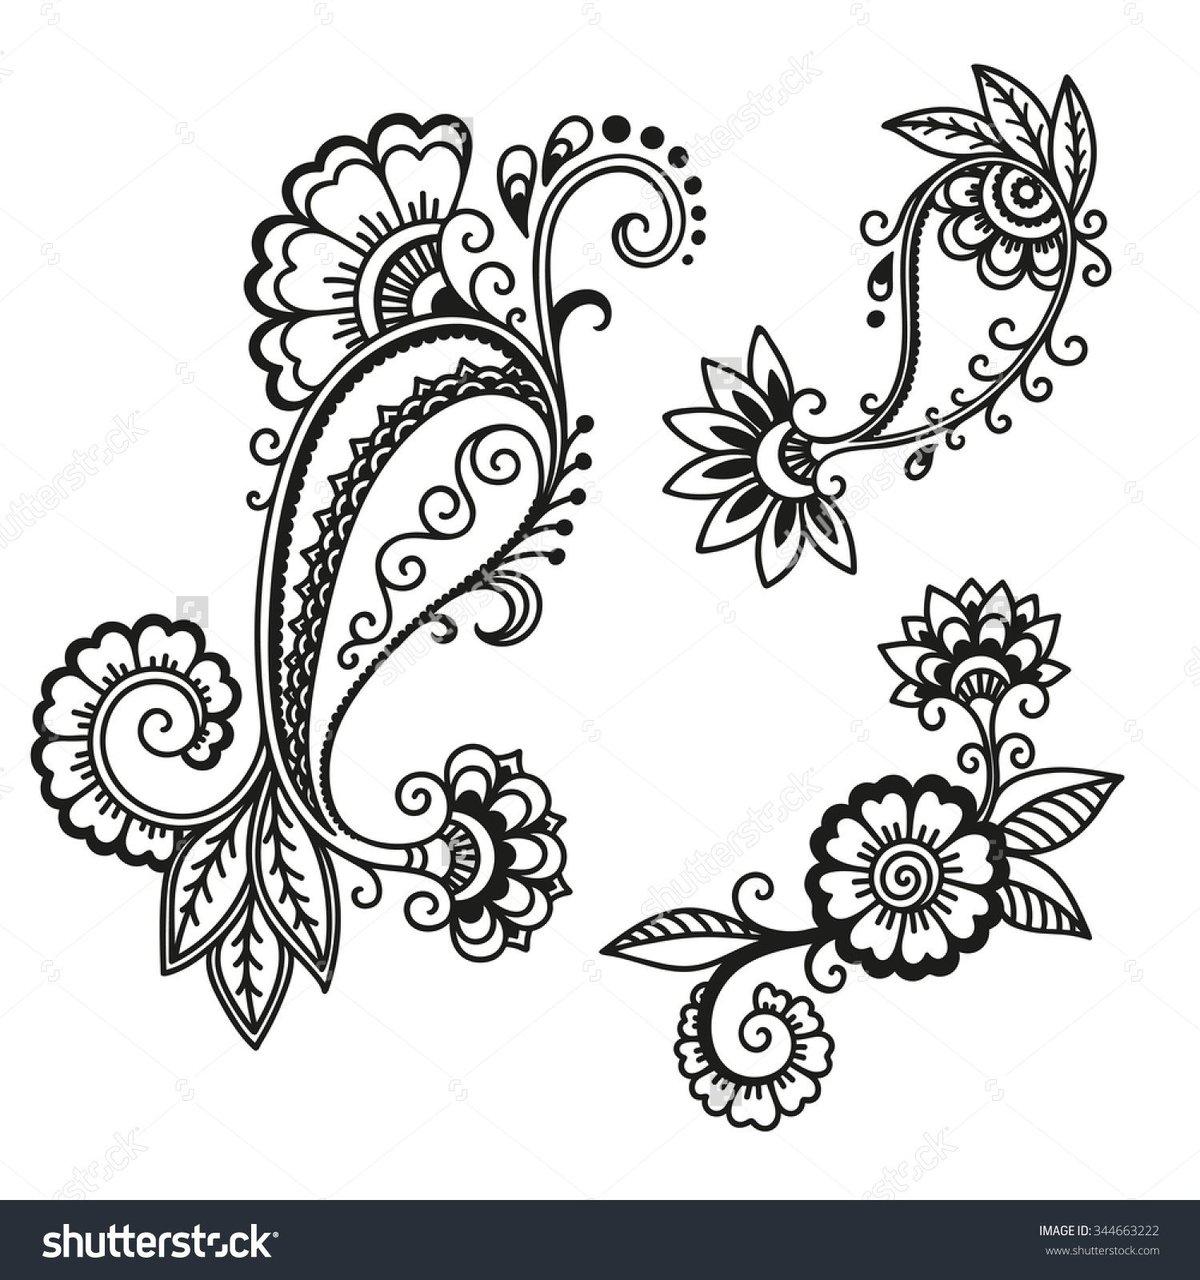 Henna Flower Designs Drawings Www Galleryhip Com The Hippe Card